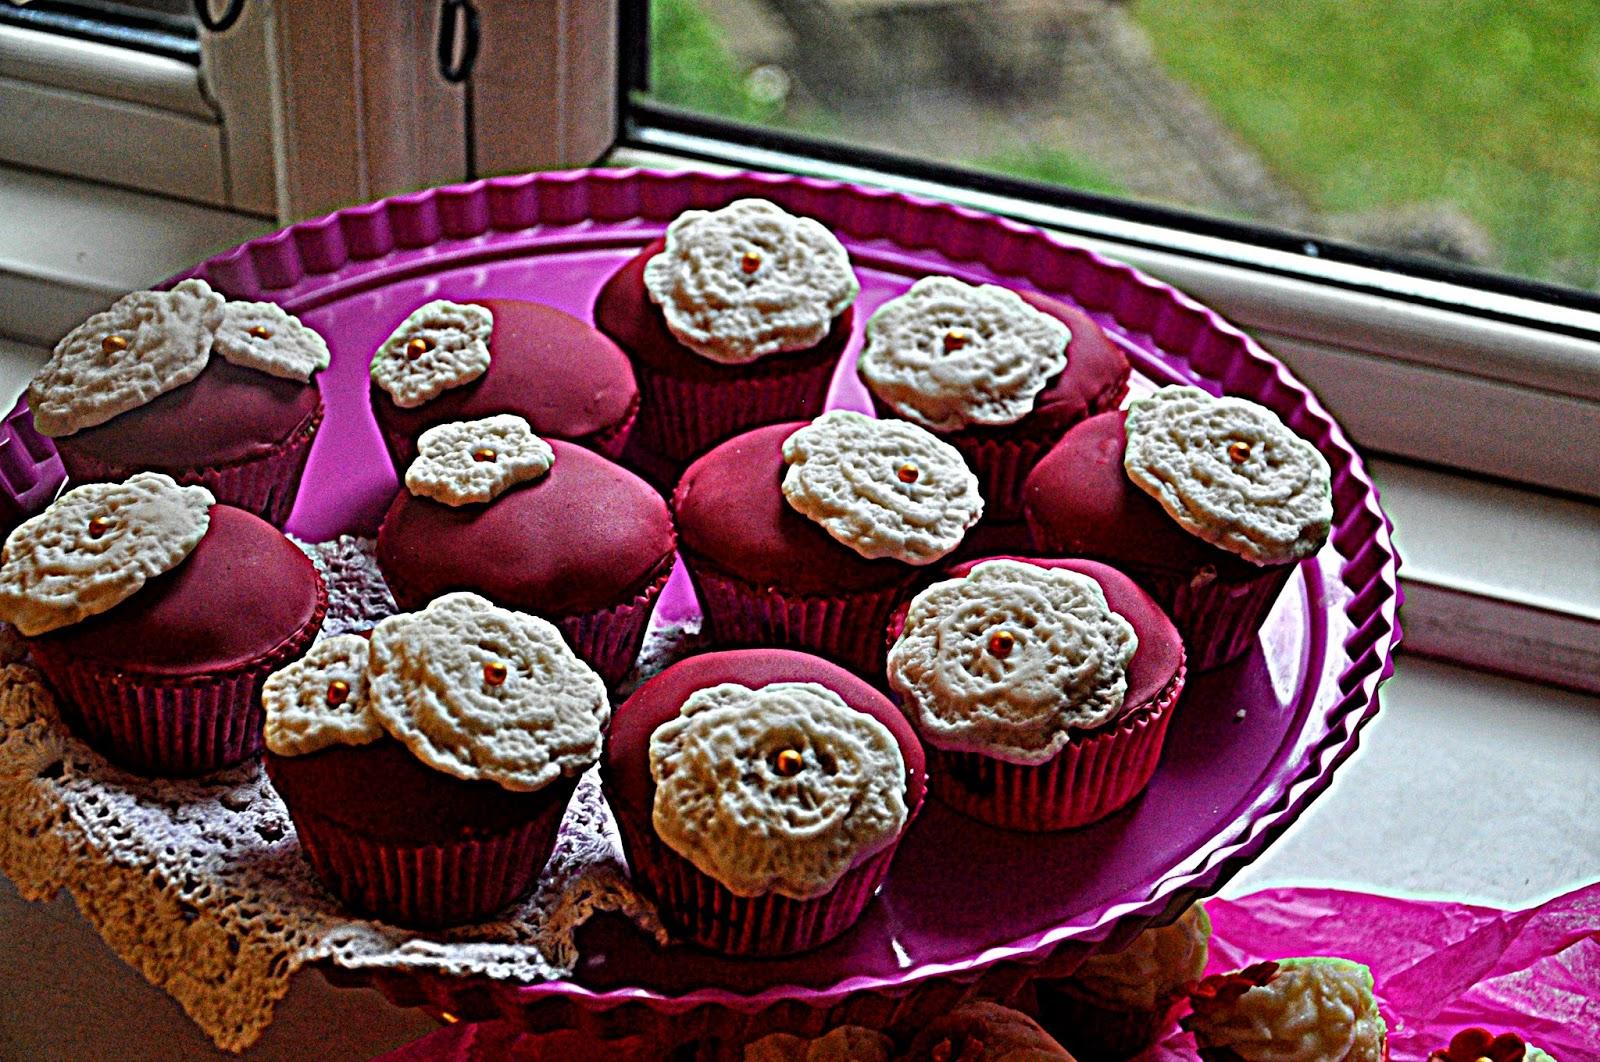 http://cupcakeluvs.blogspot.dk/2014/05/cupcake-med-hkleirer-crochet-cupcakes.html